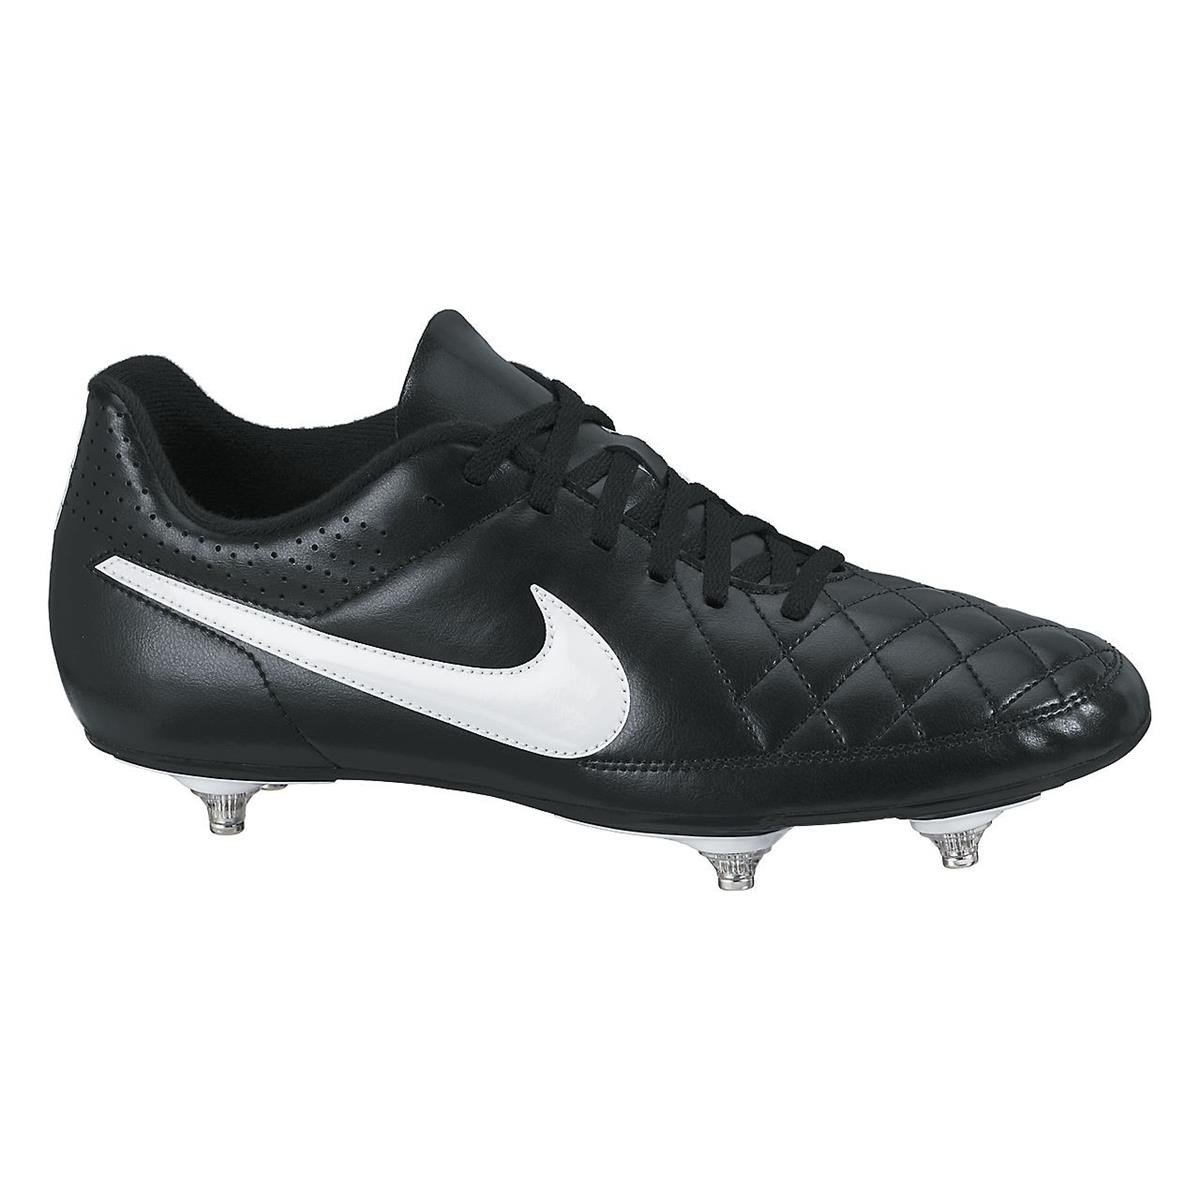 a46390aa8467 Nike teempo Rio II SG Mens Football Boots 631288 Soccer Cleats (UK 7 US 8  EU 41